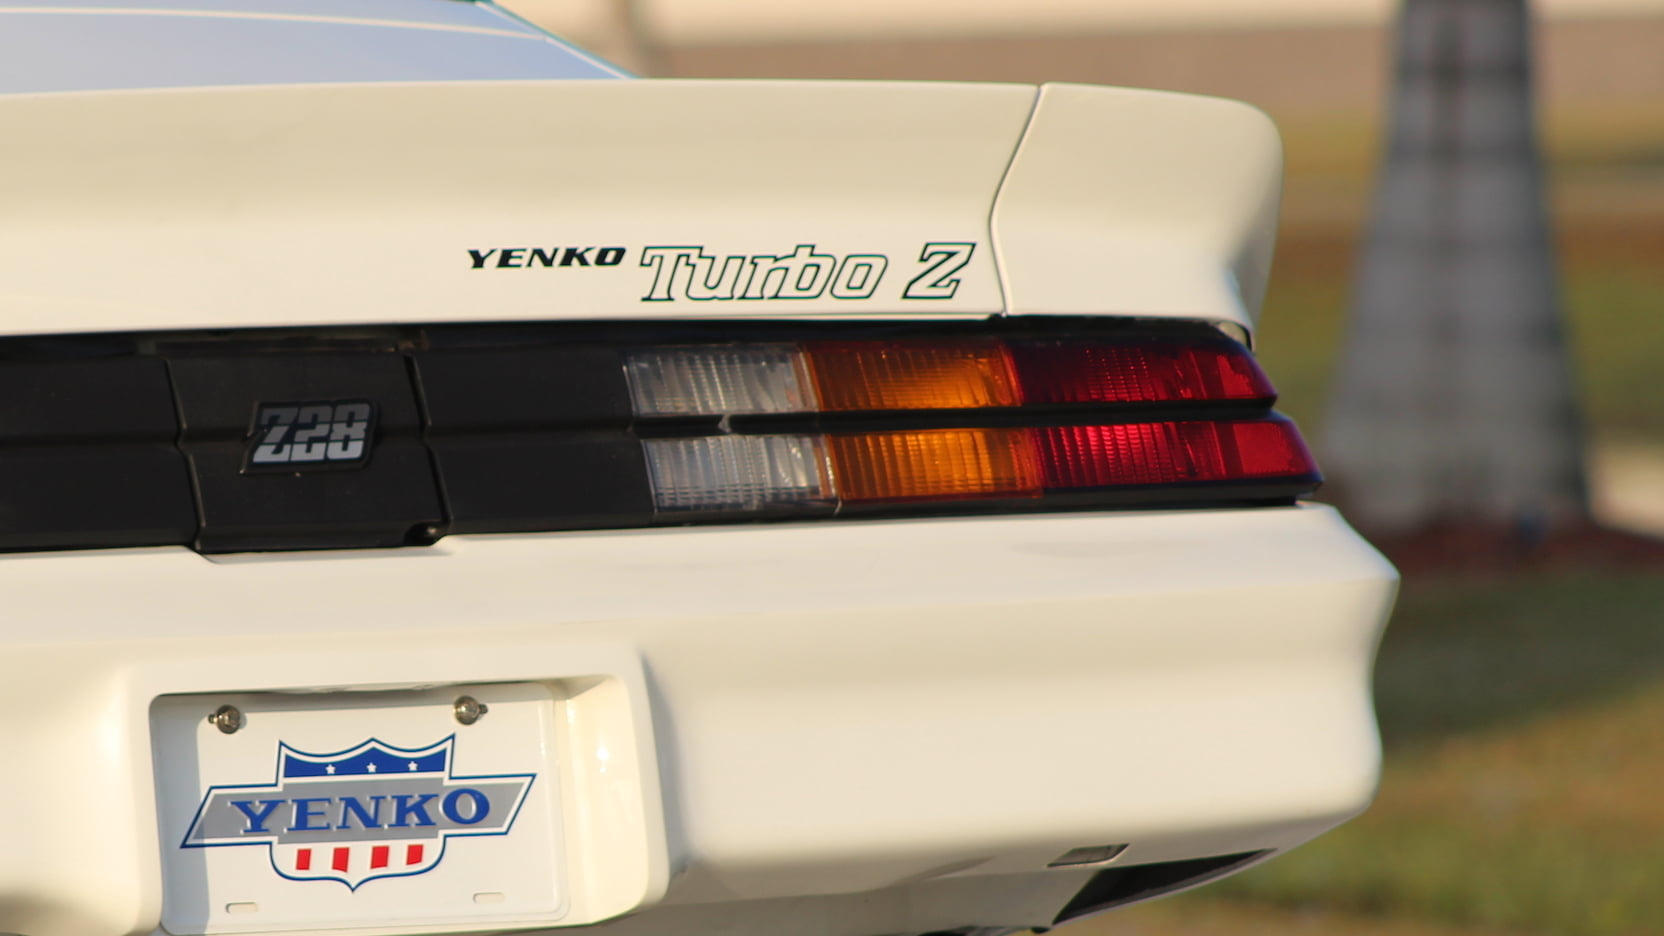 1981 Chevrolet Yenko Turbo Z rear detail